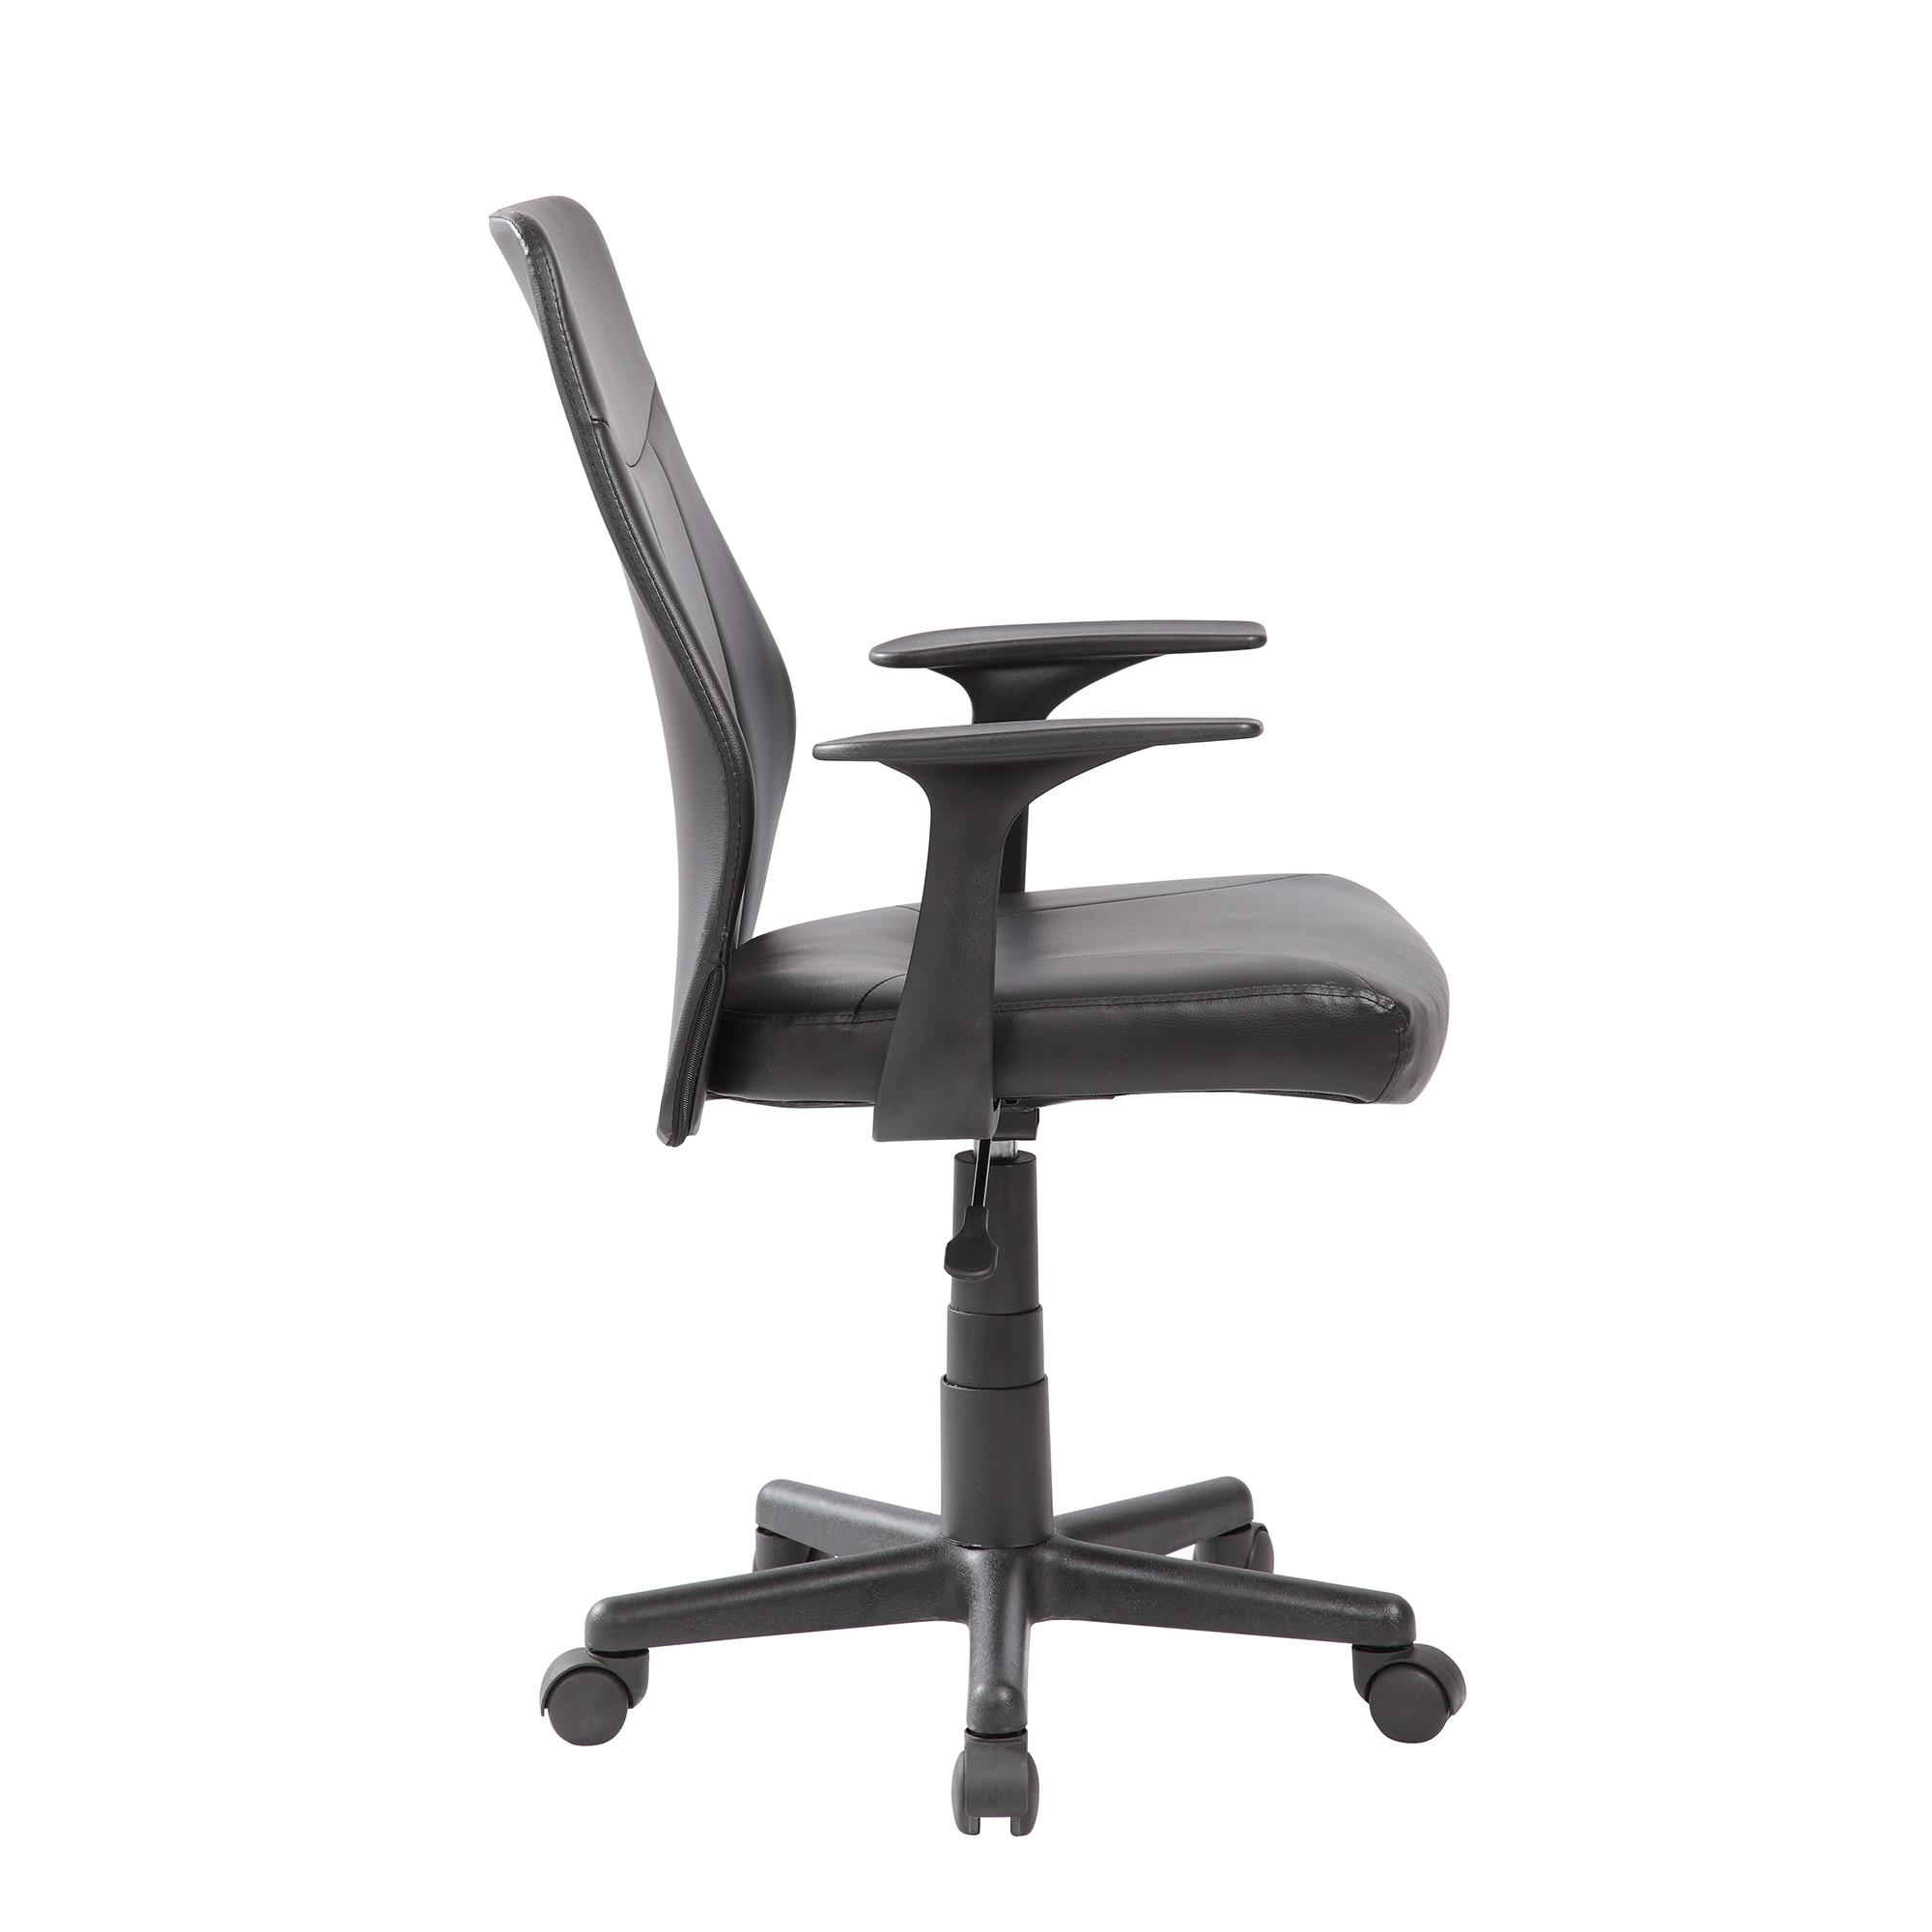 kring macao irodai szék ár